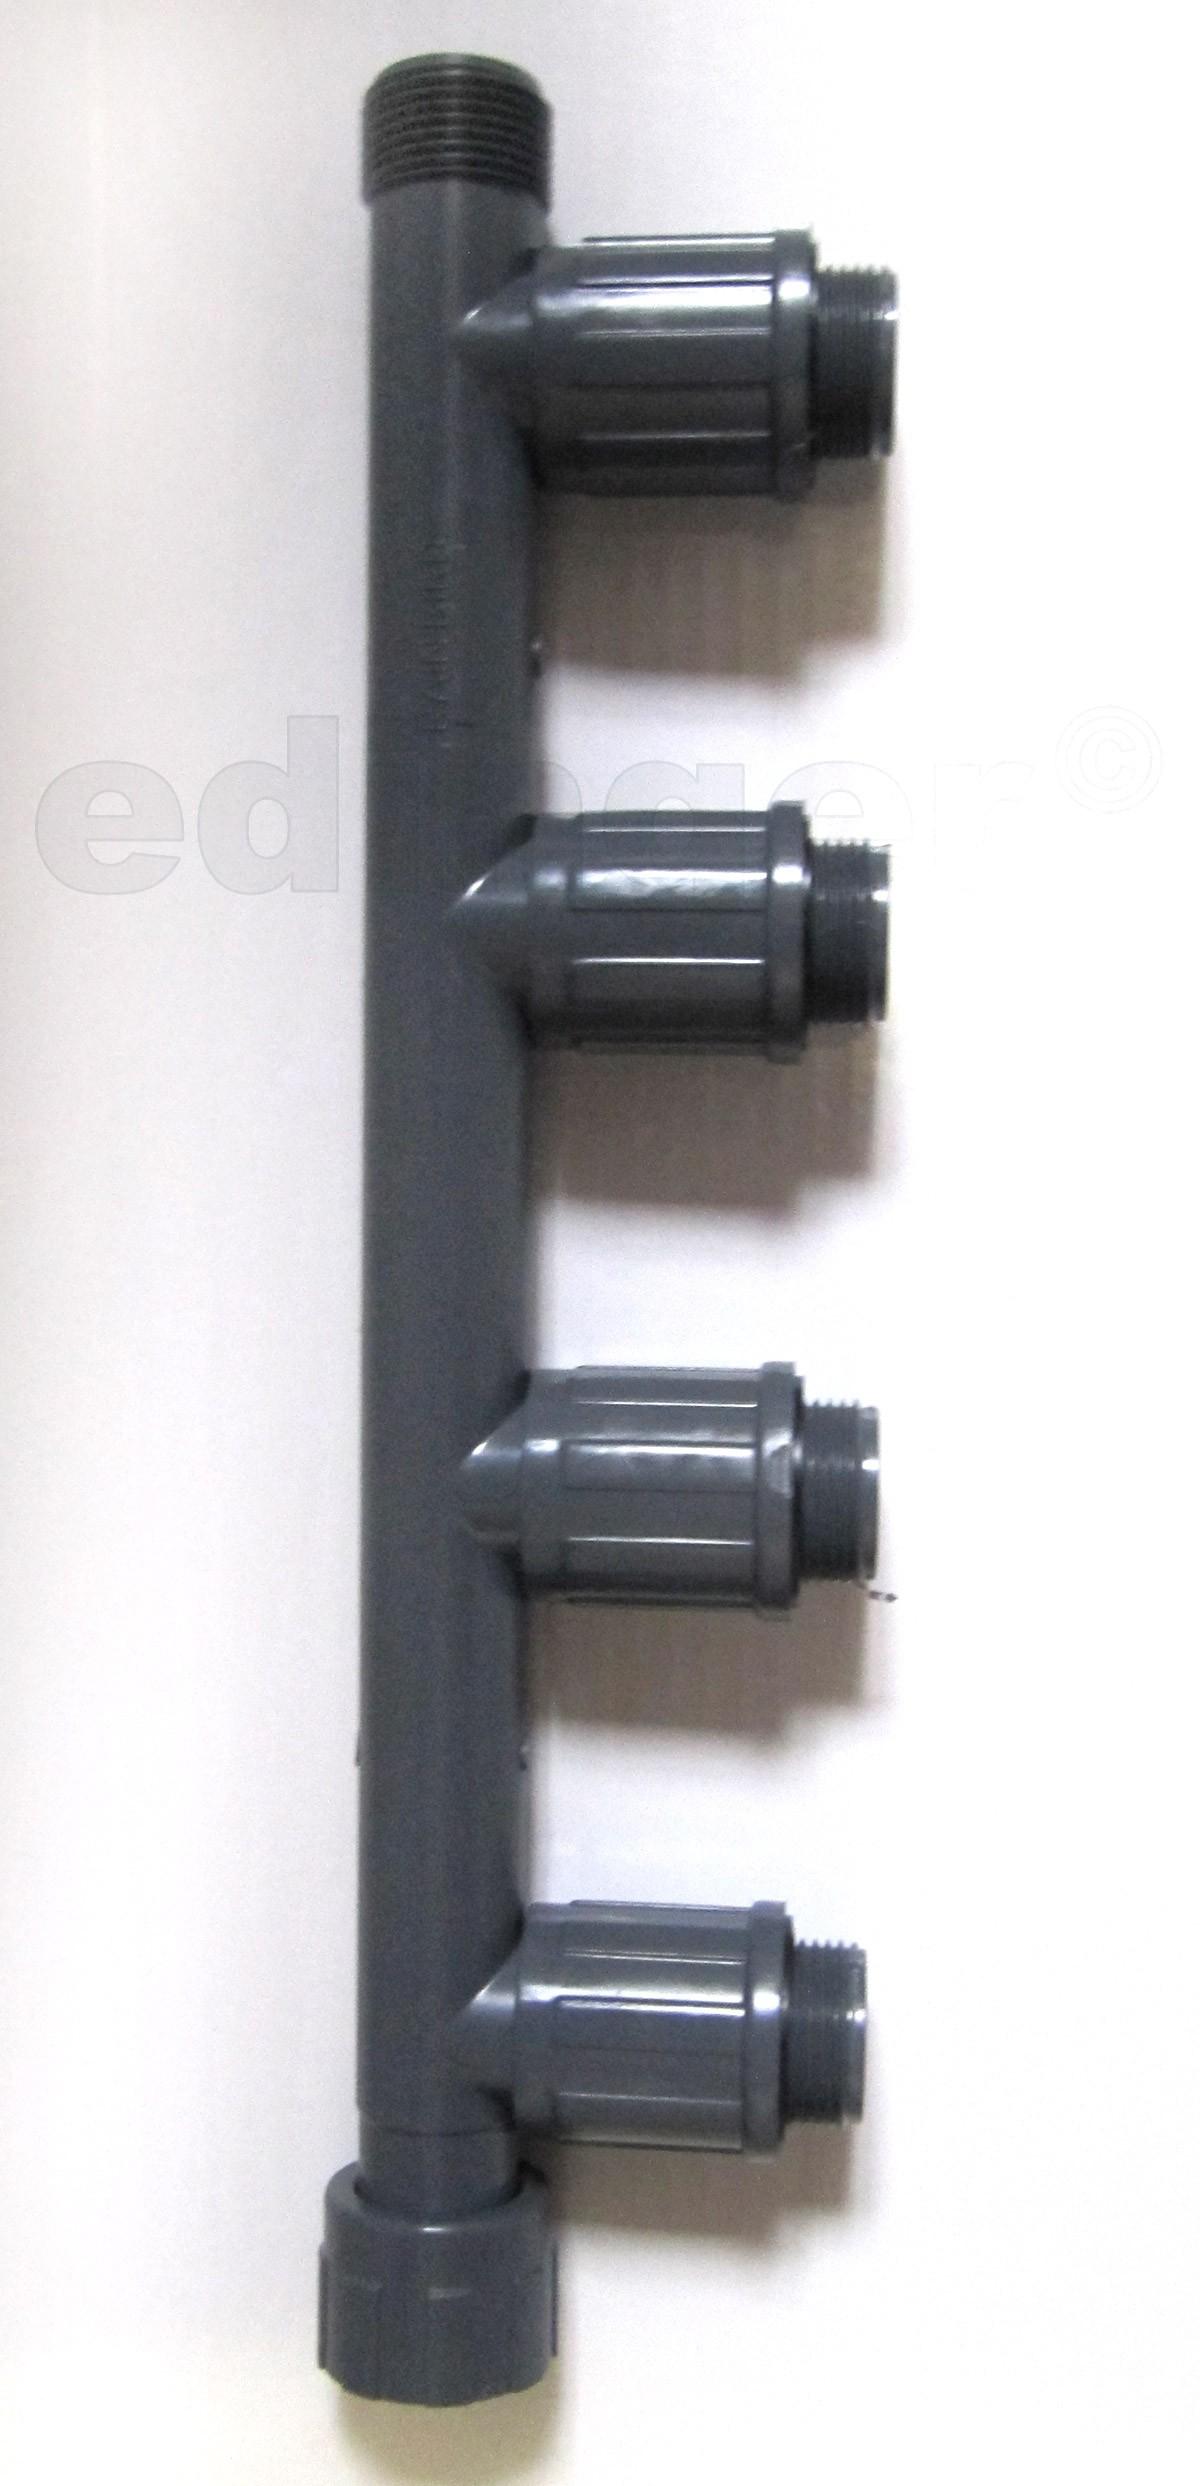 "Rainbird Verteiler RB1301-410 Verschraubung 1""IGx1""AGx1""AG Bild 1"